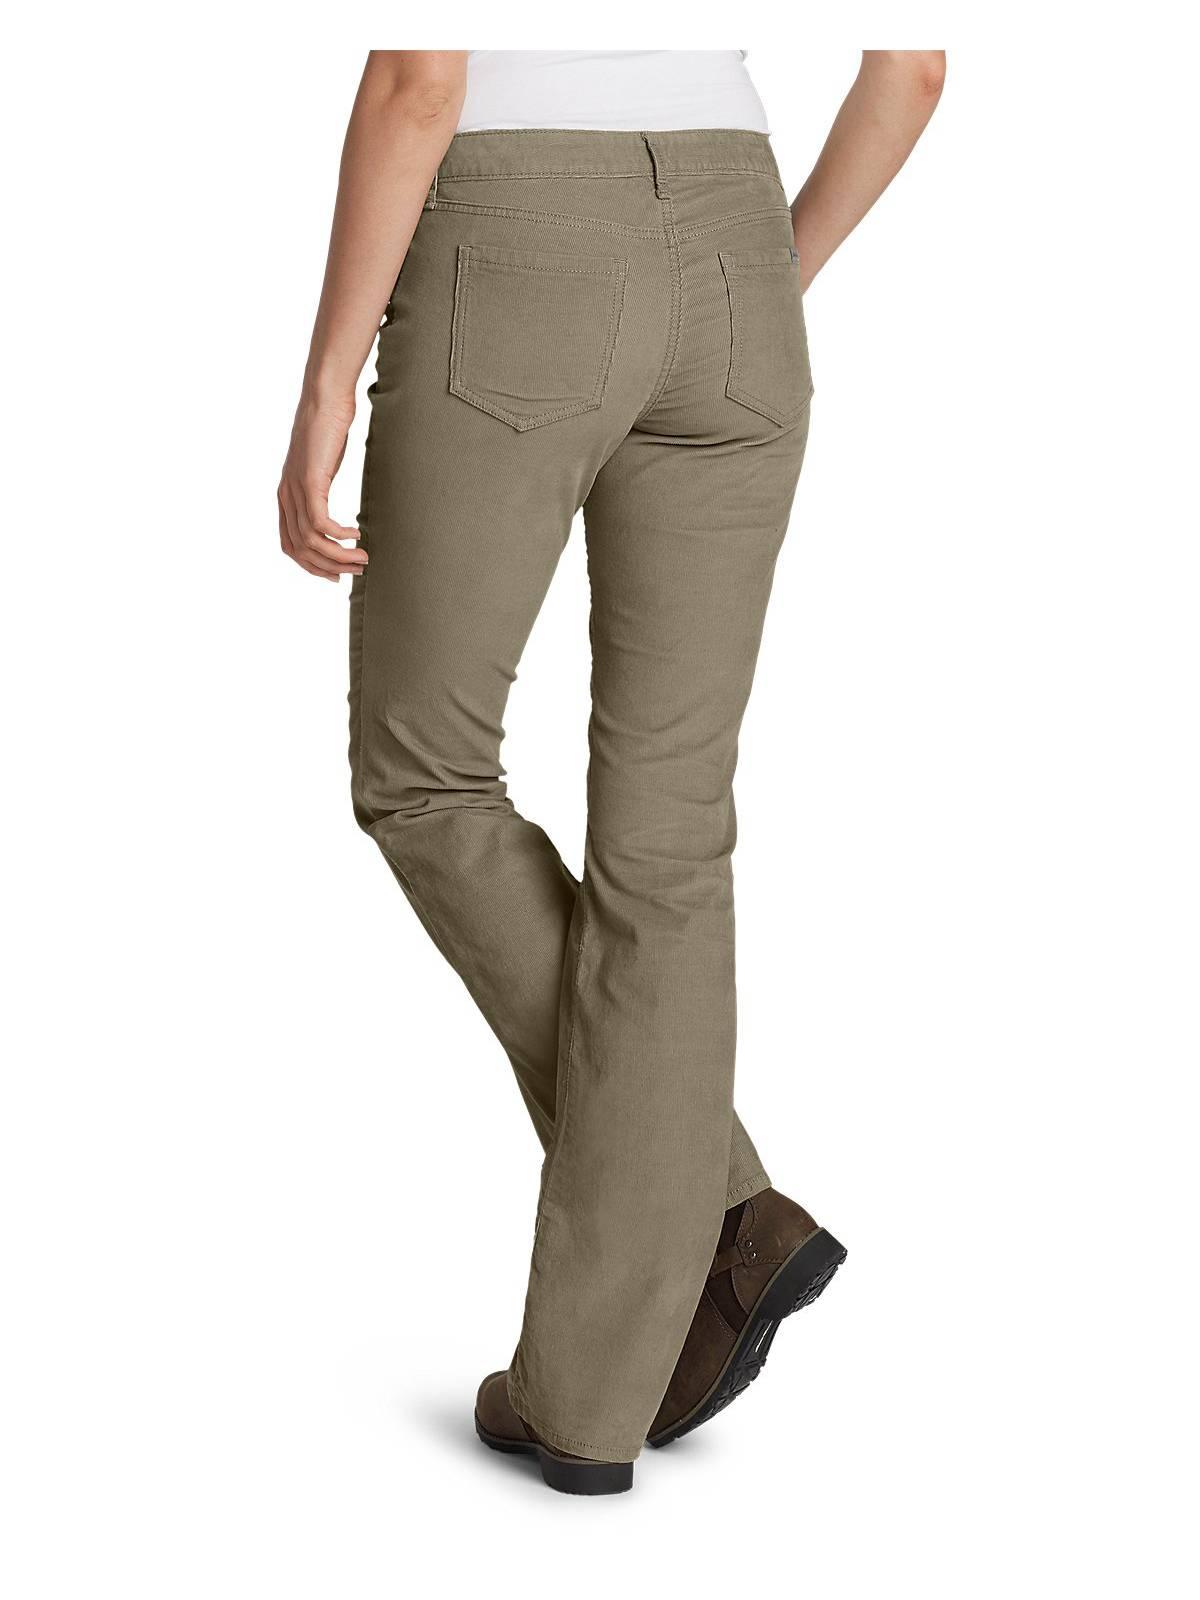 c0f5a0ca Eddie Bauer Women's Curvy Bootcut Cord Pants | eBay